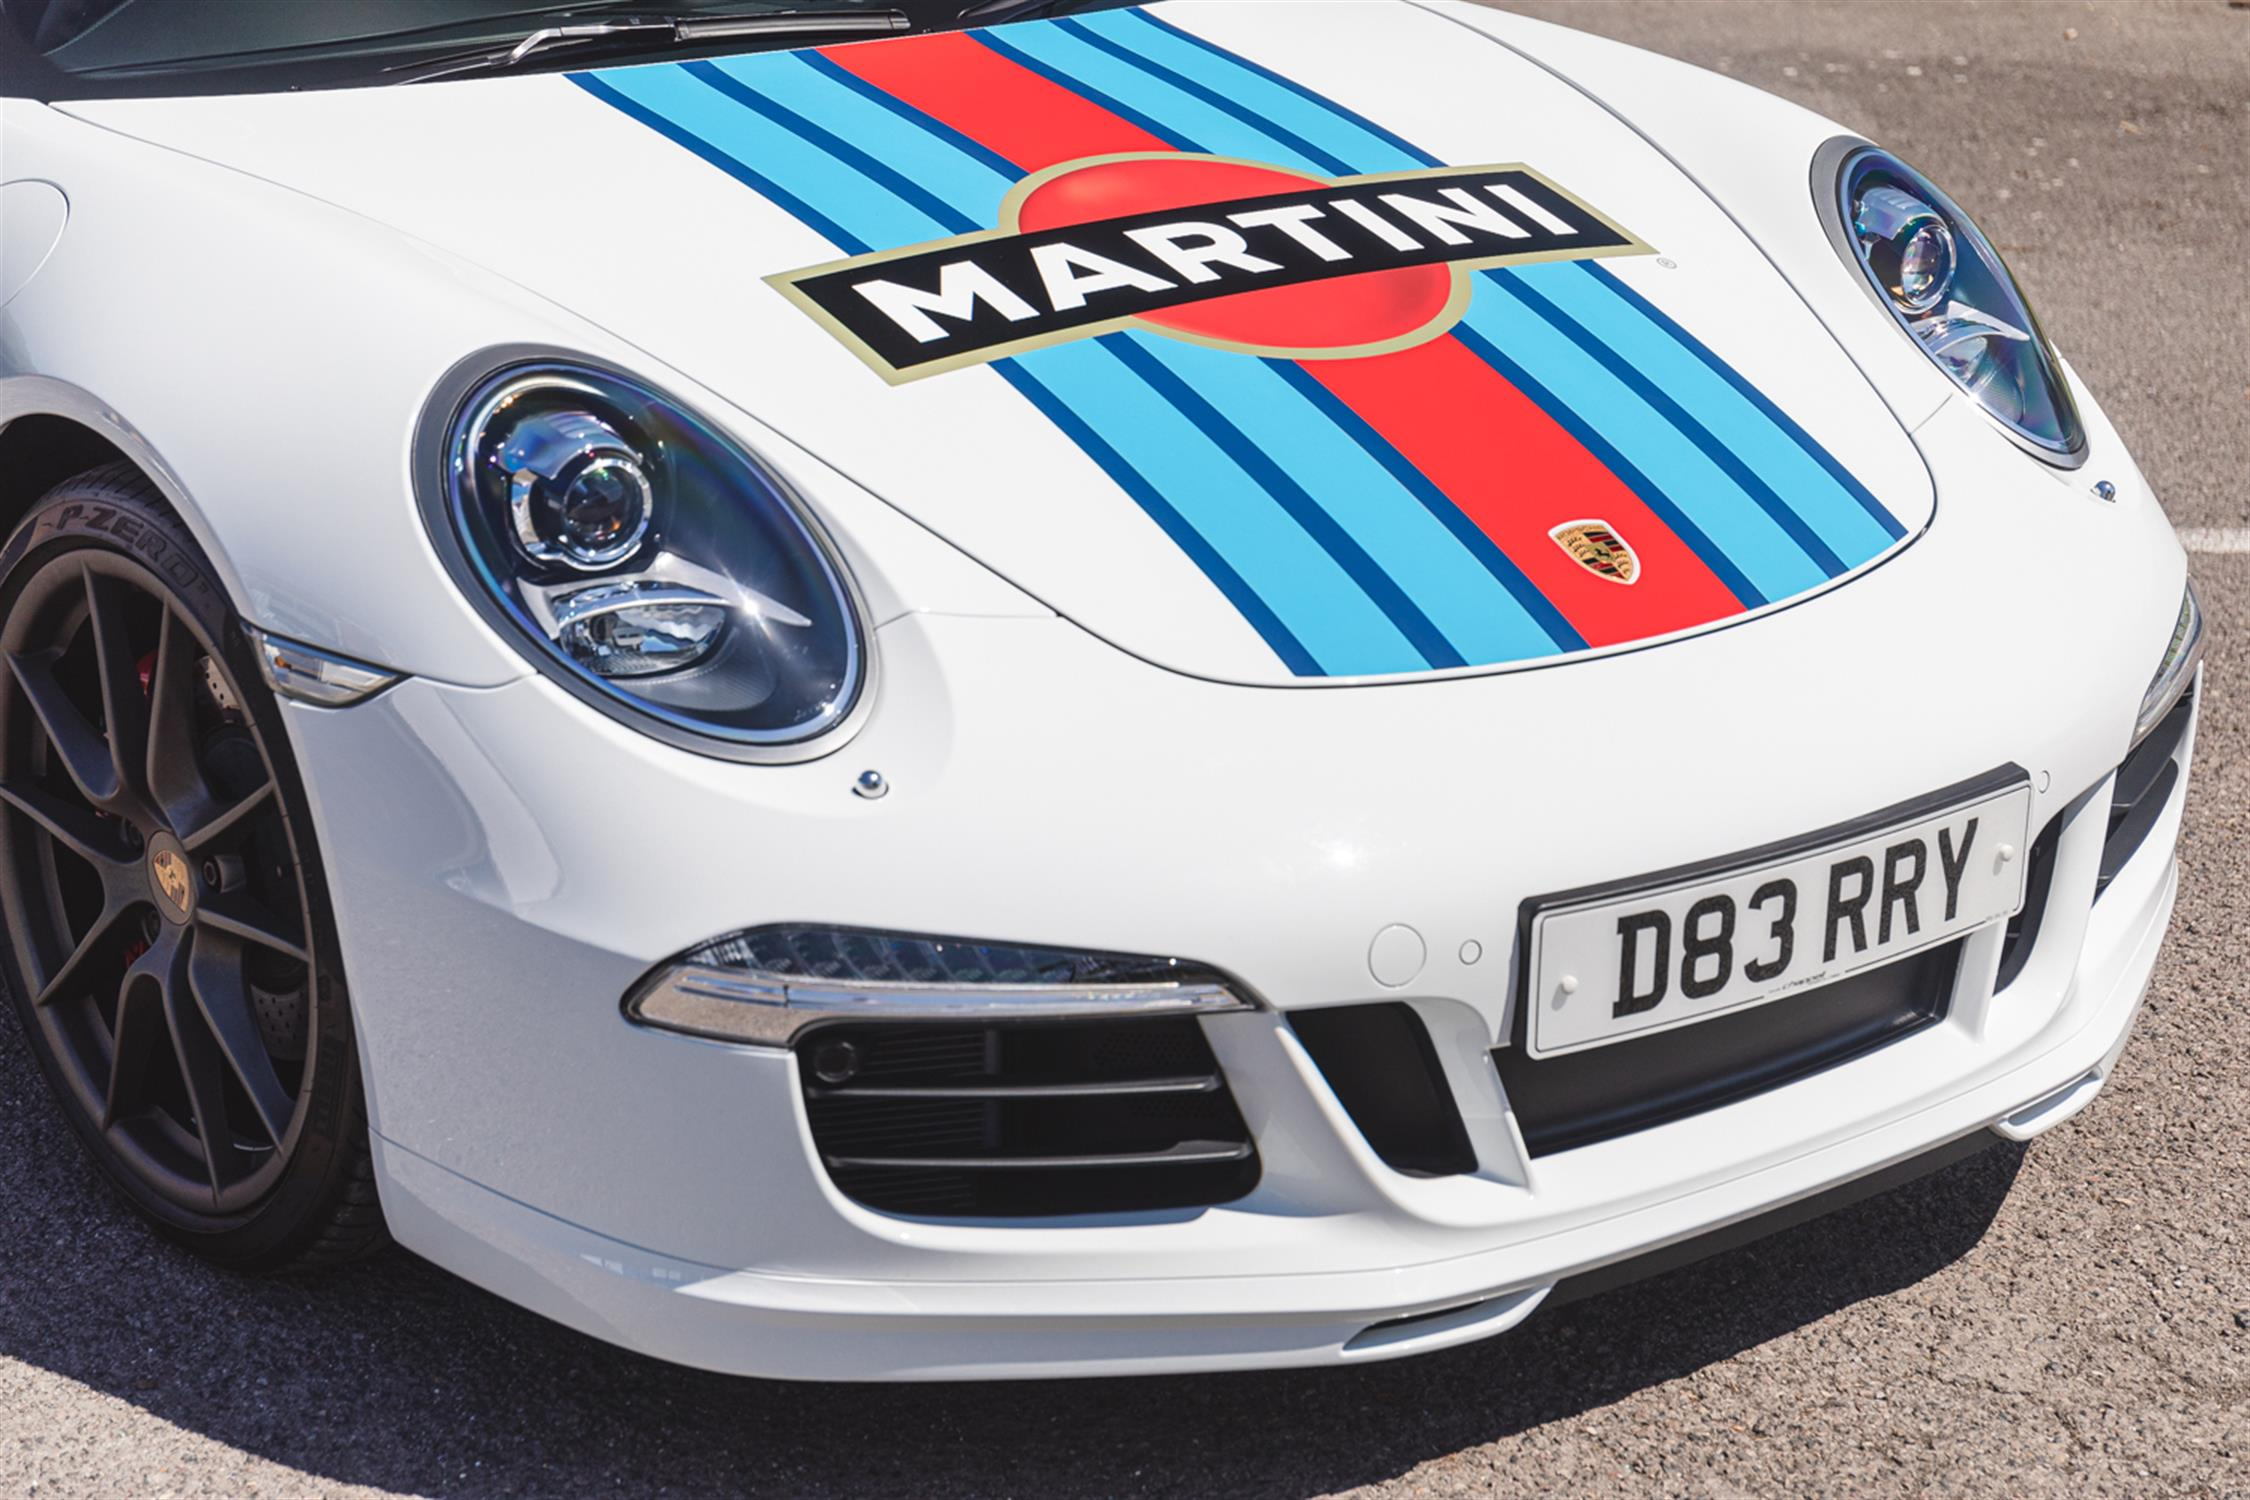 2014 Porsche 911 (991) 3.8 Martini Racing Edition (RHD) - Image 7 of 10